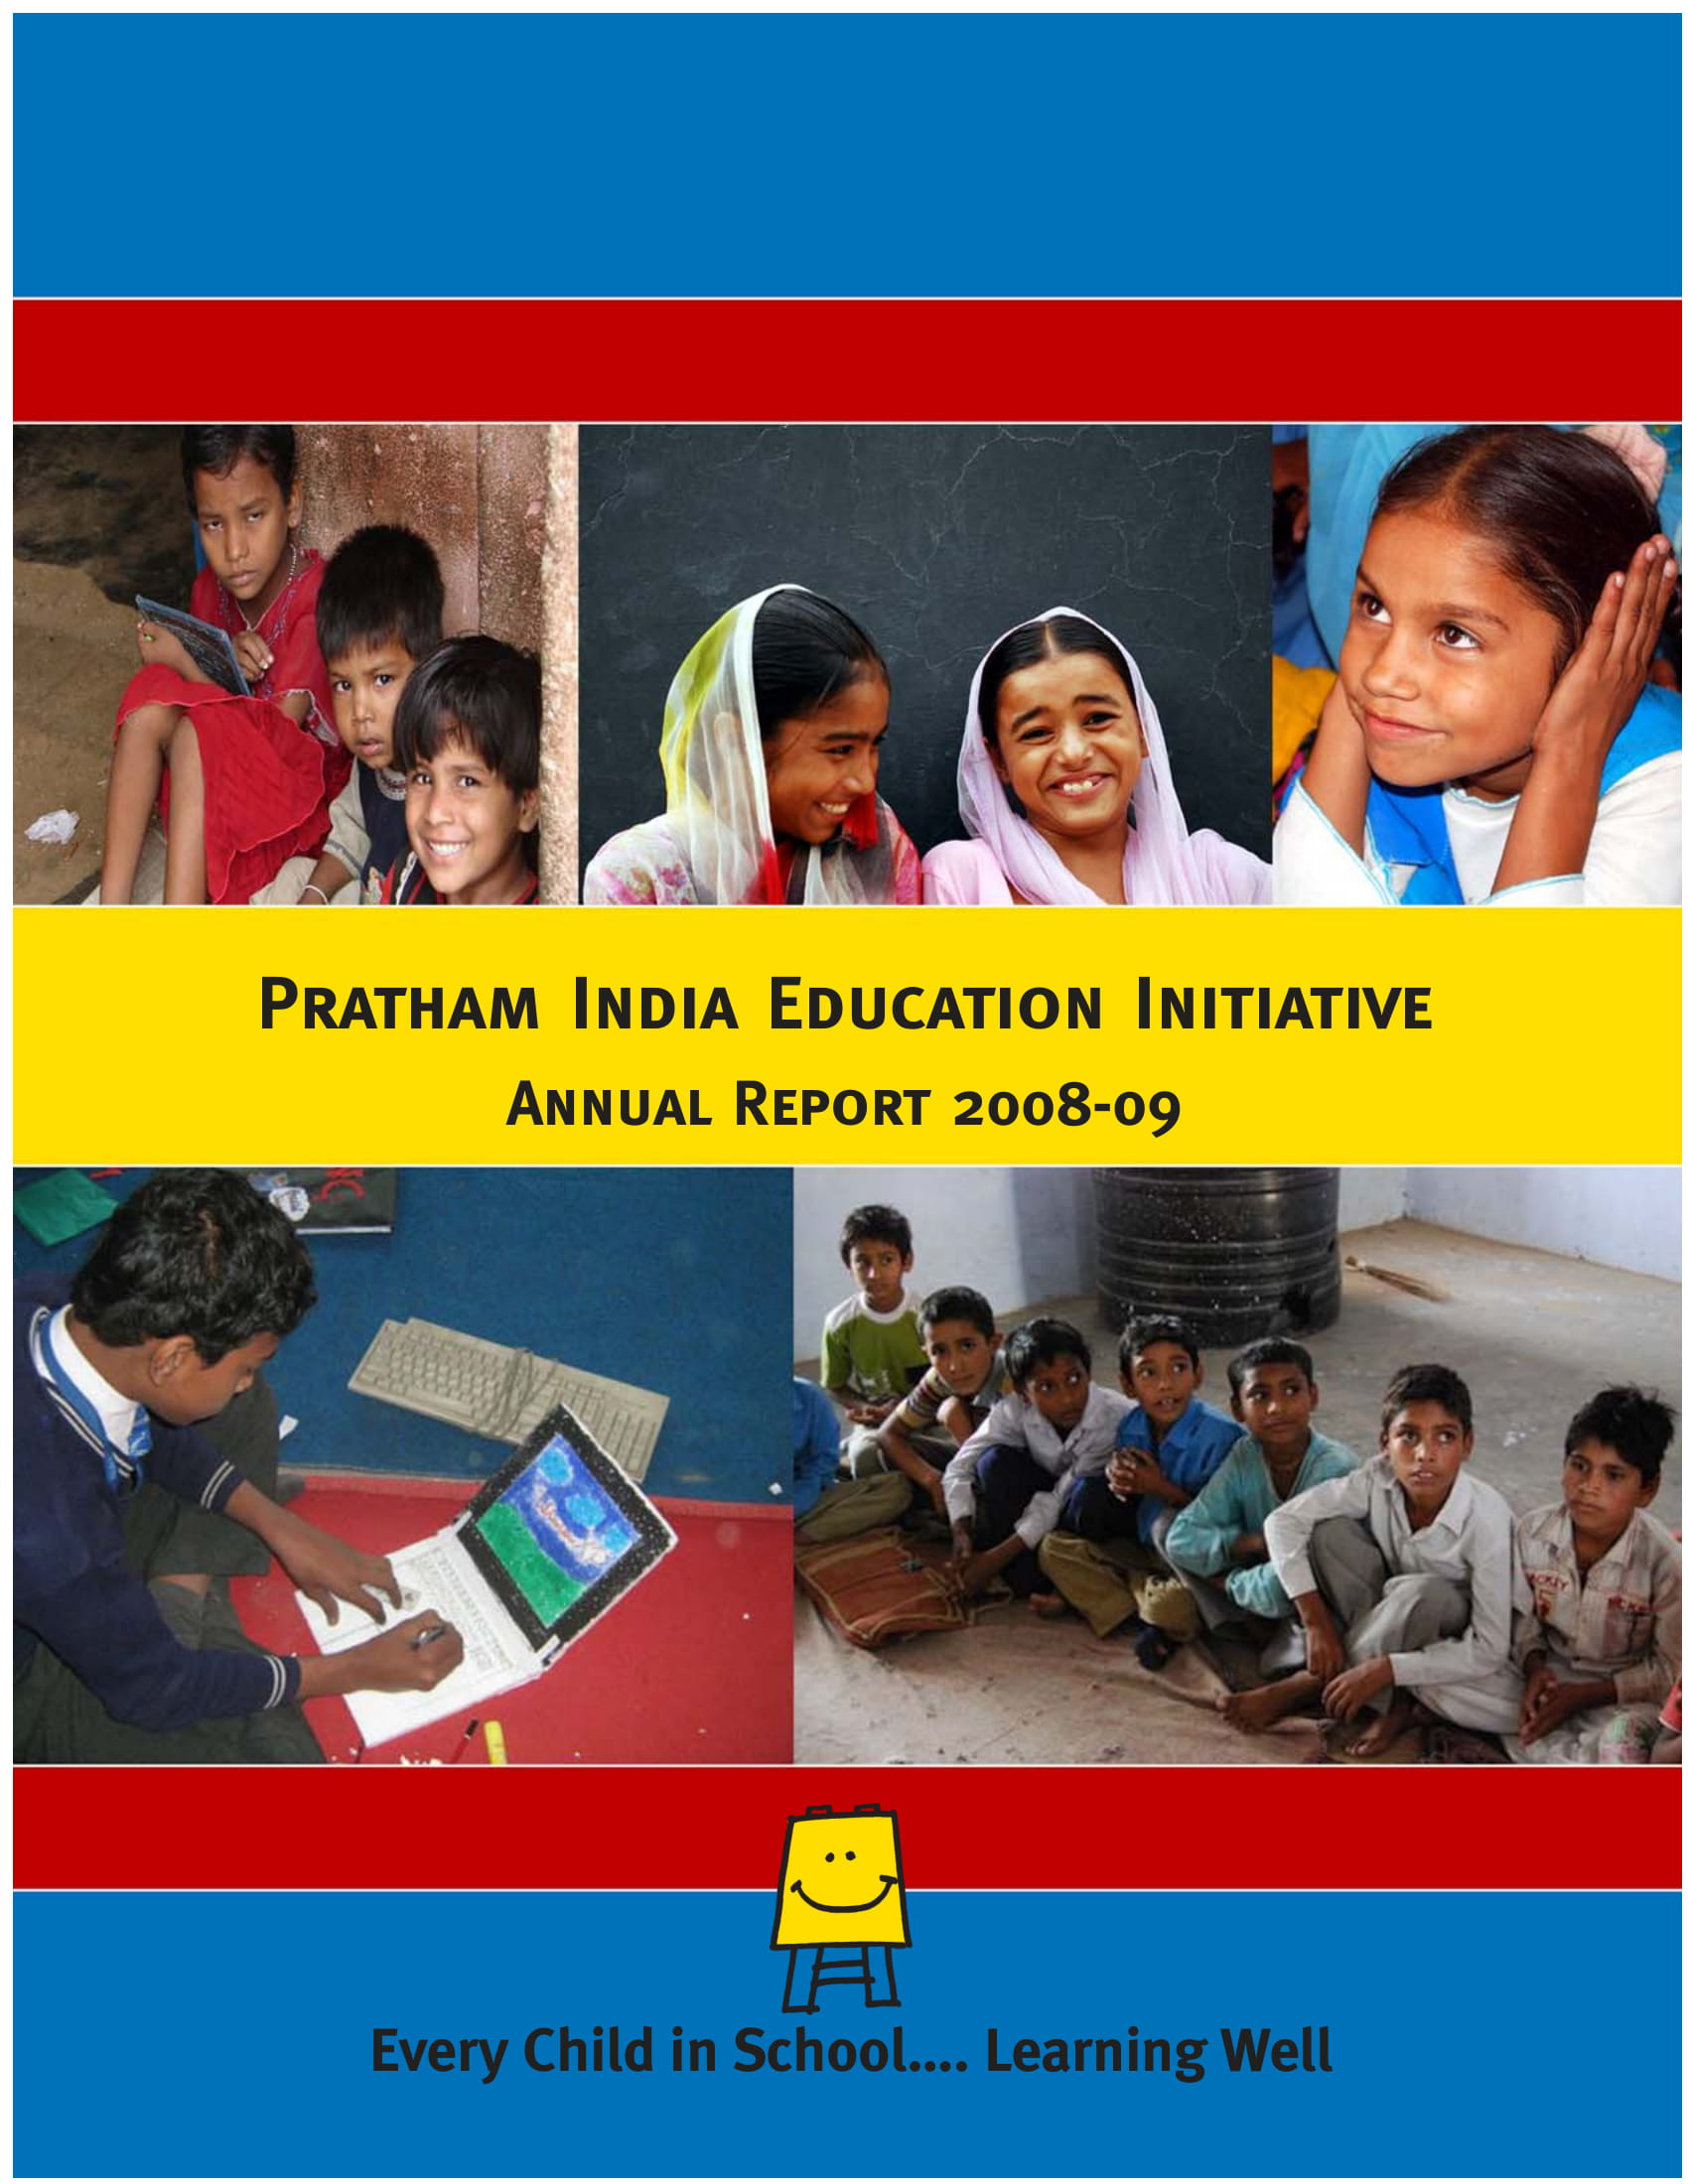 pratham ngo annual report example